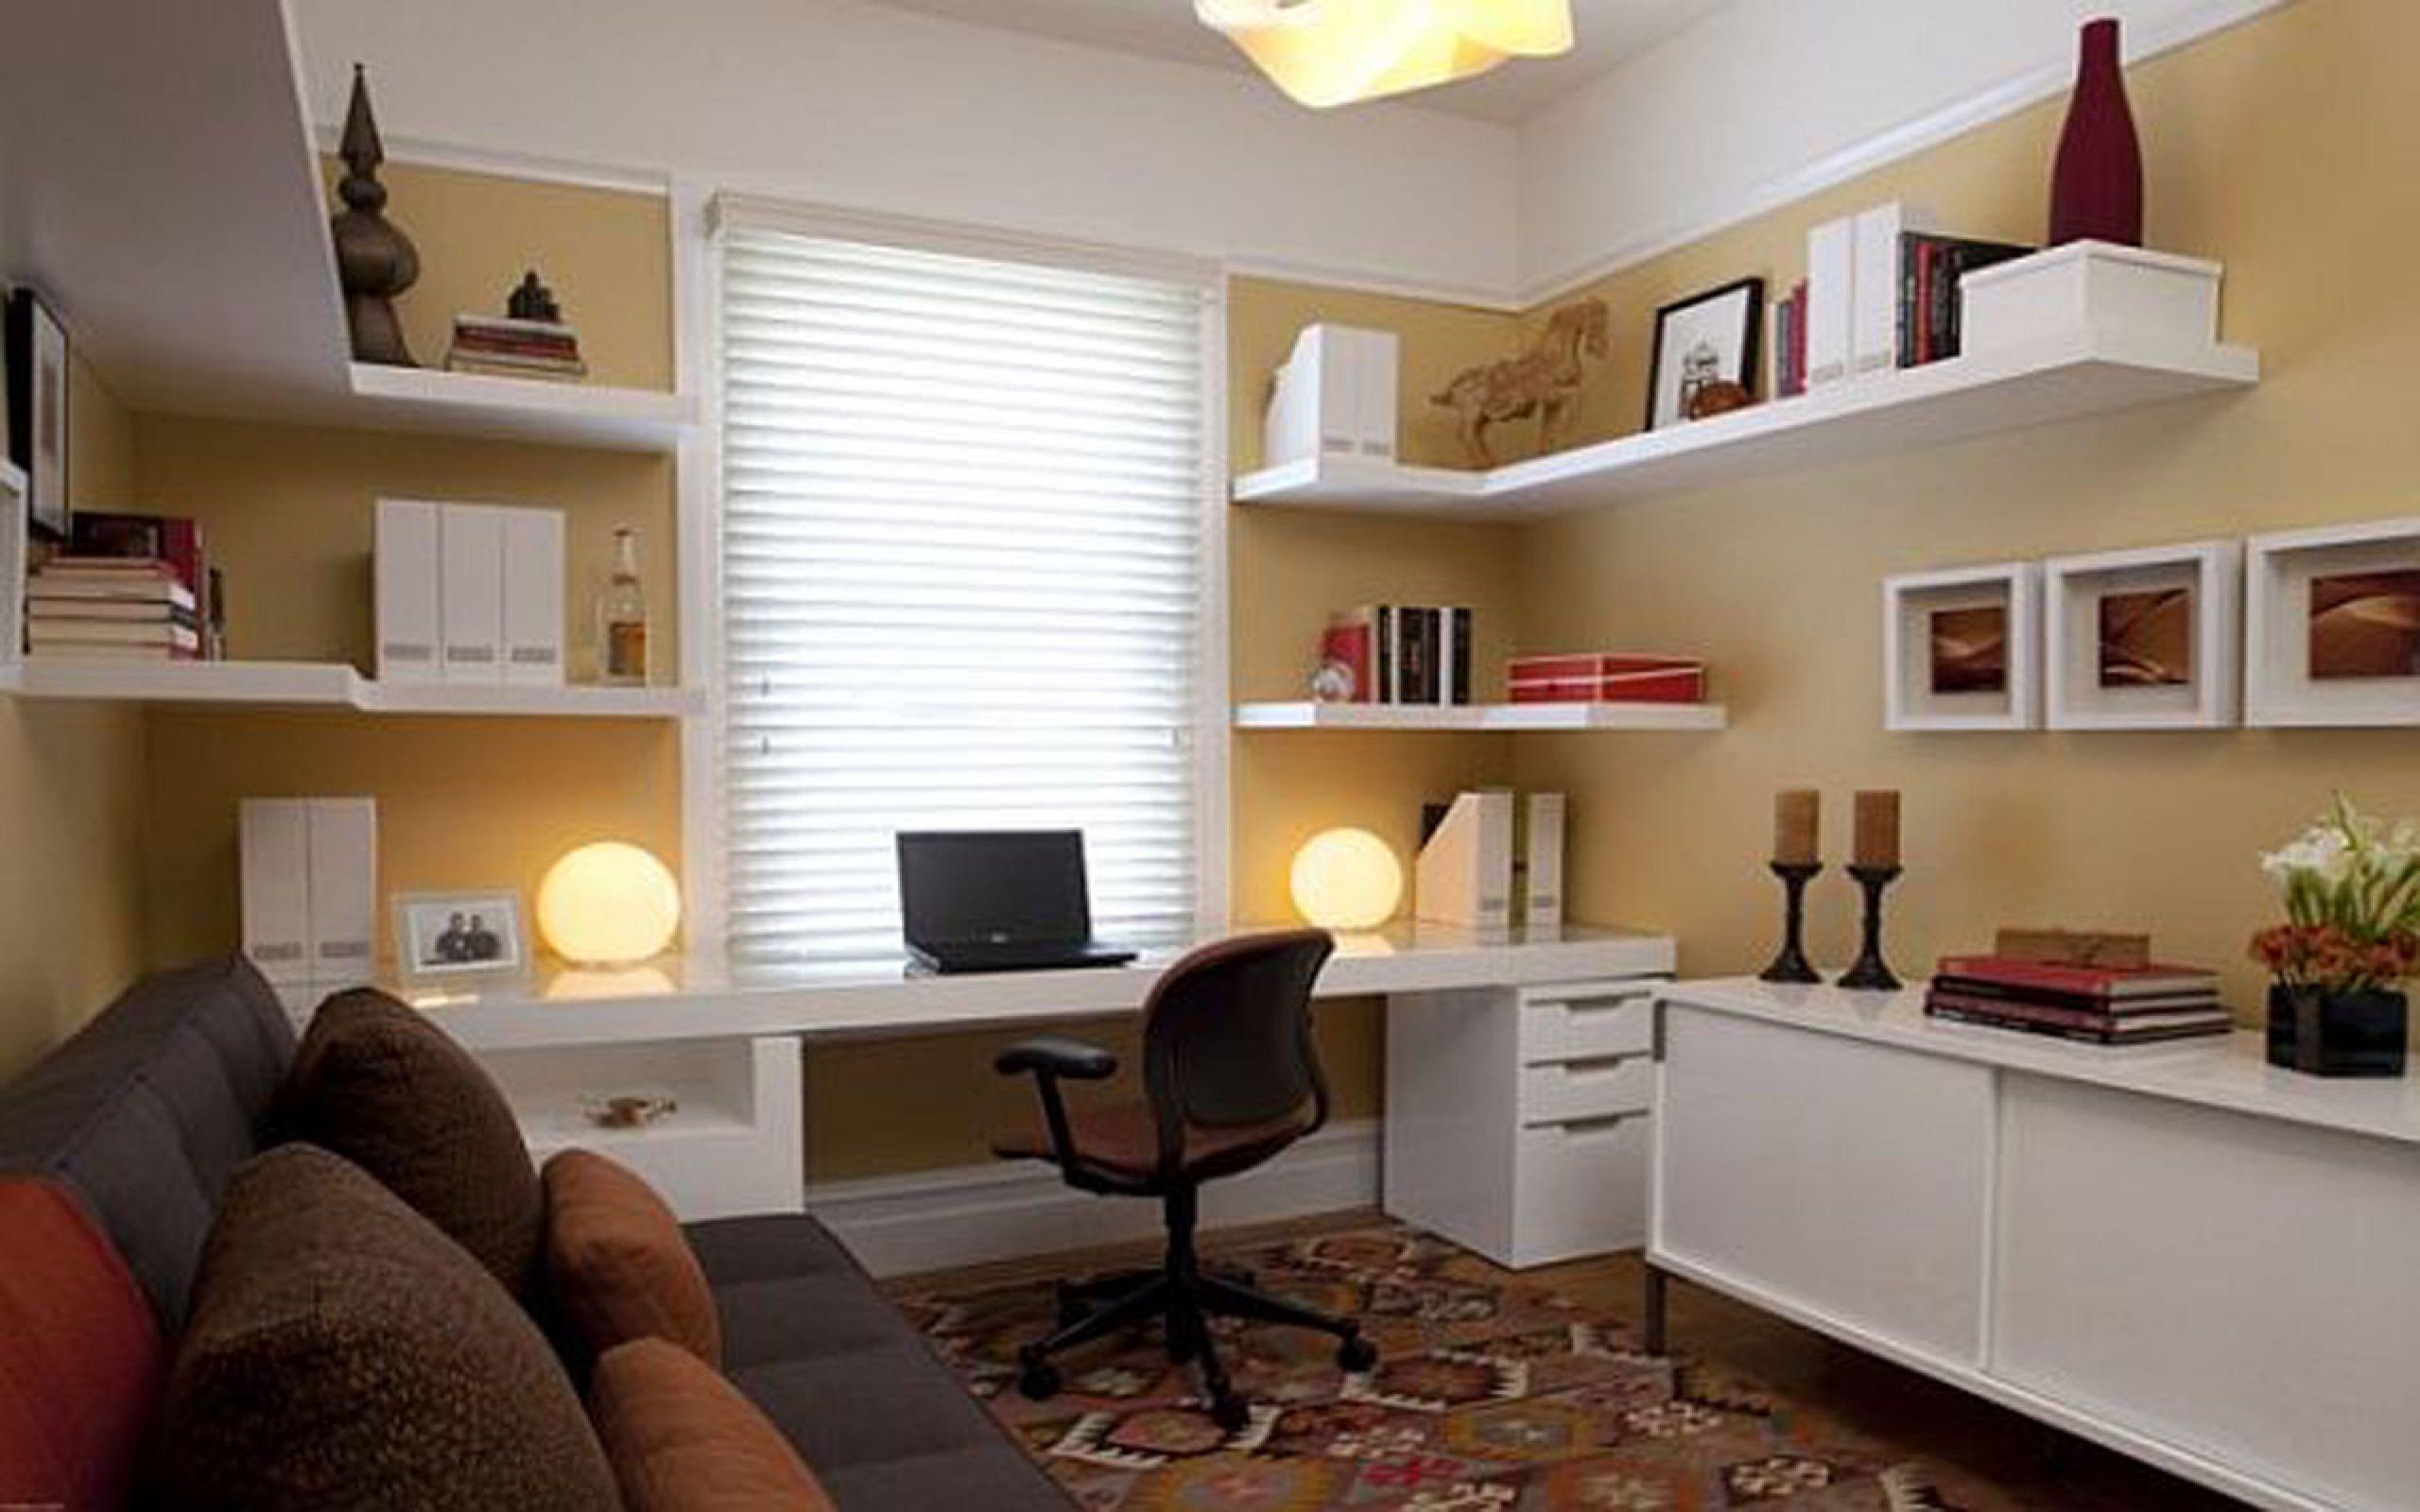 IKEA Home Office Ideas | ... ikea office ideas, chic office, pottery ...